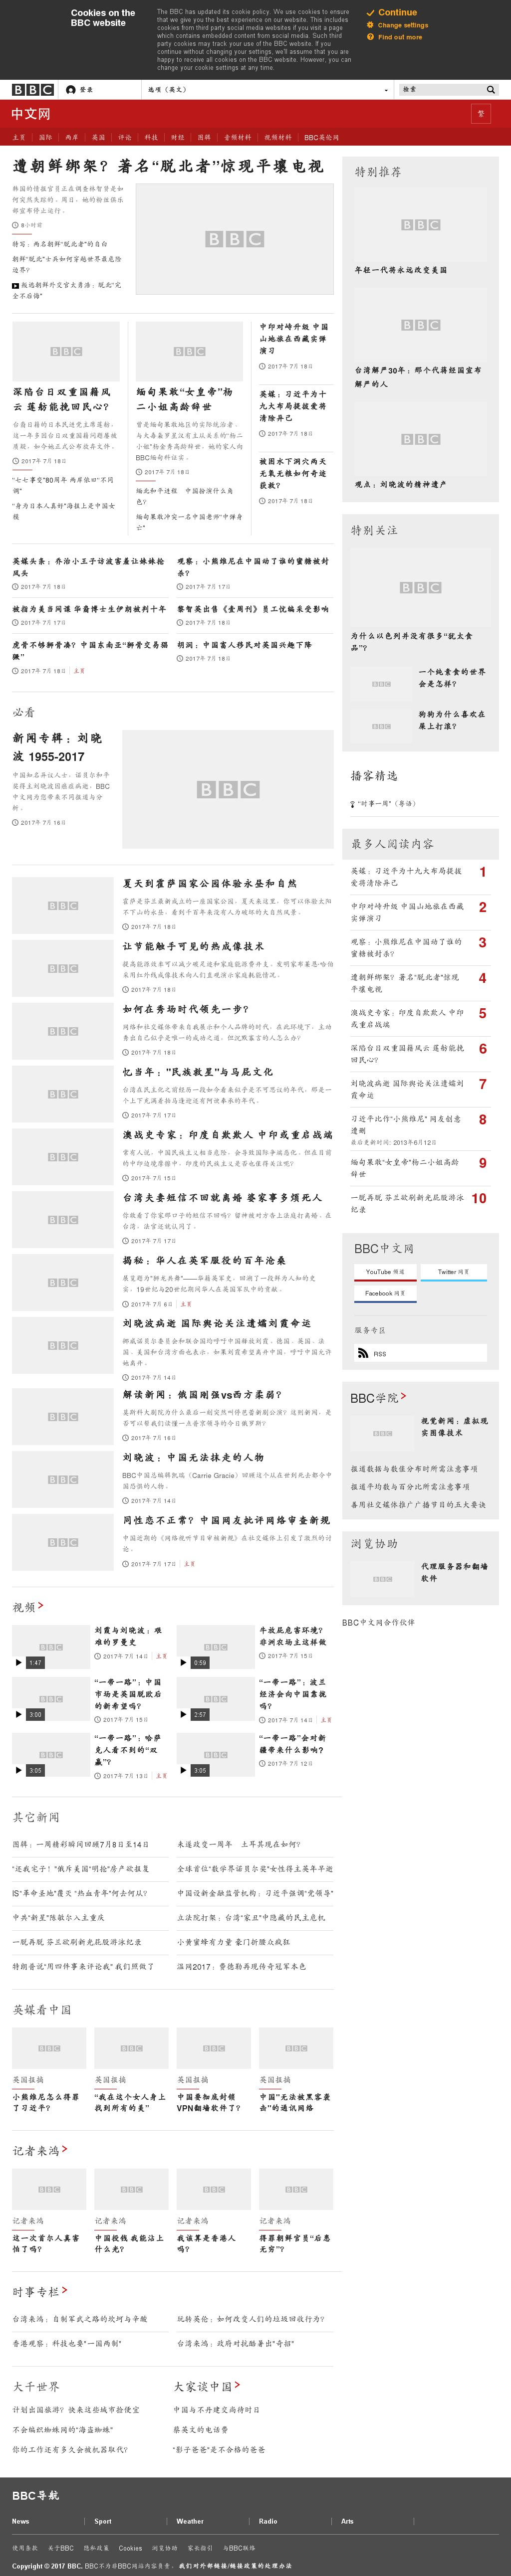 BBC (Chinese) at Wednesday July 19, 2017, 4:01 a.m. UTC